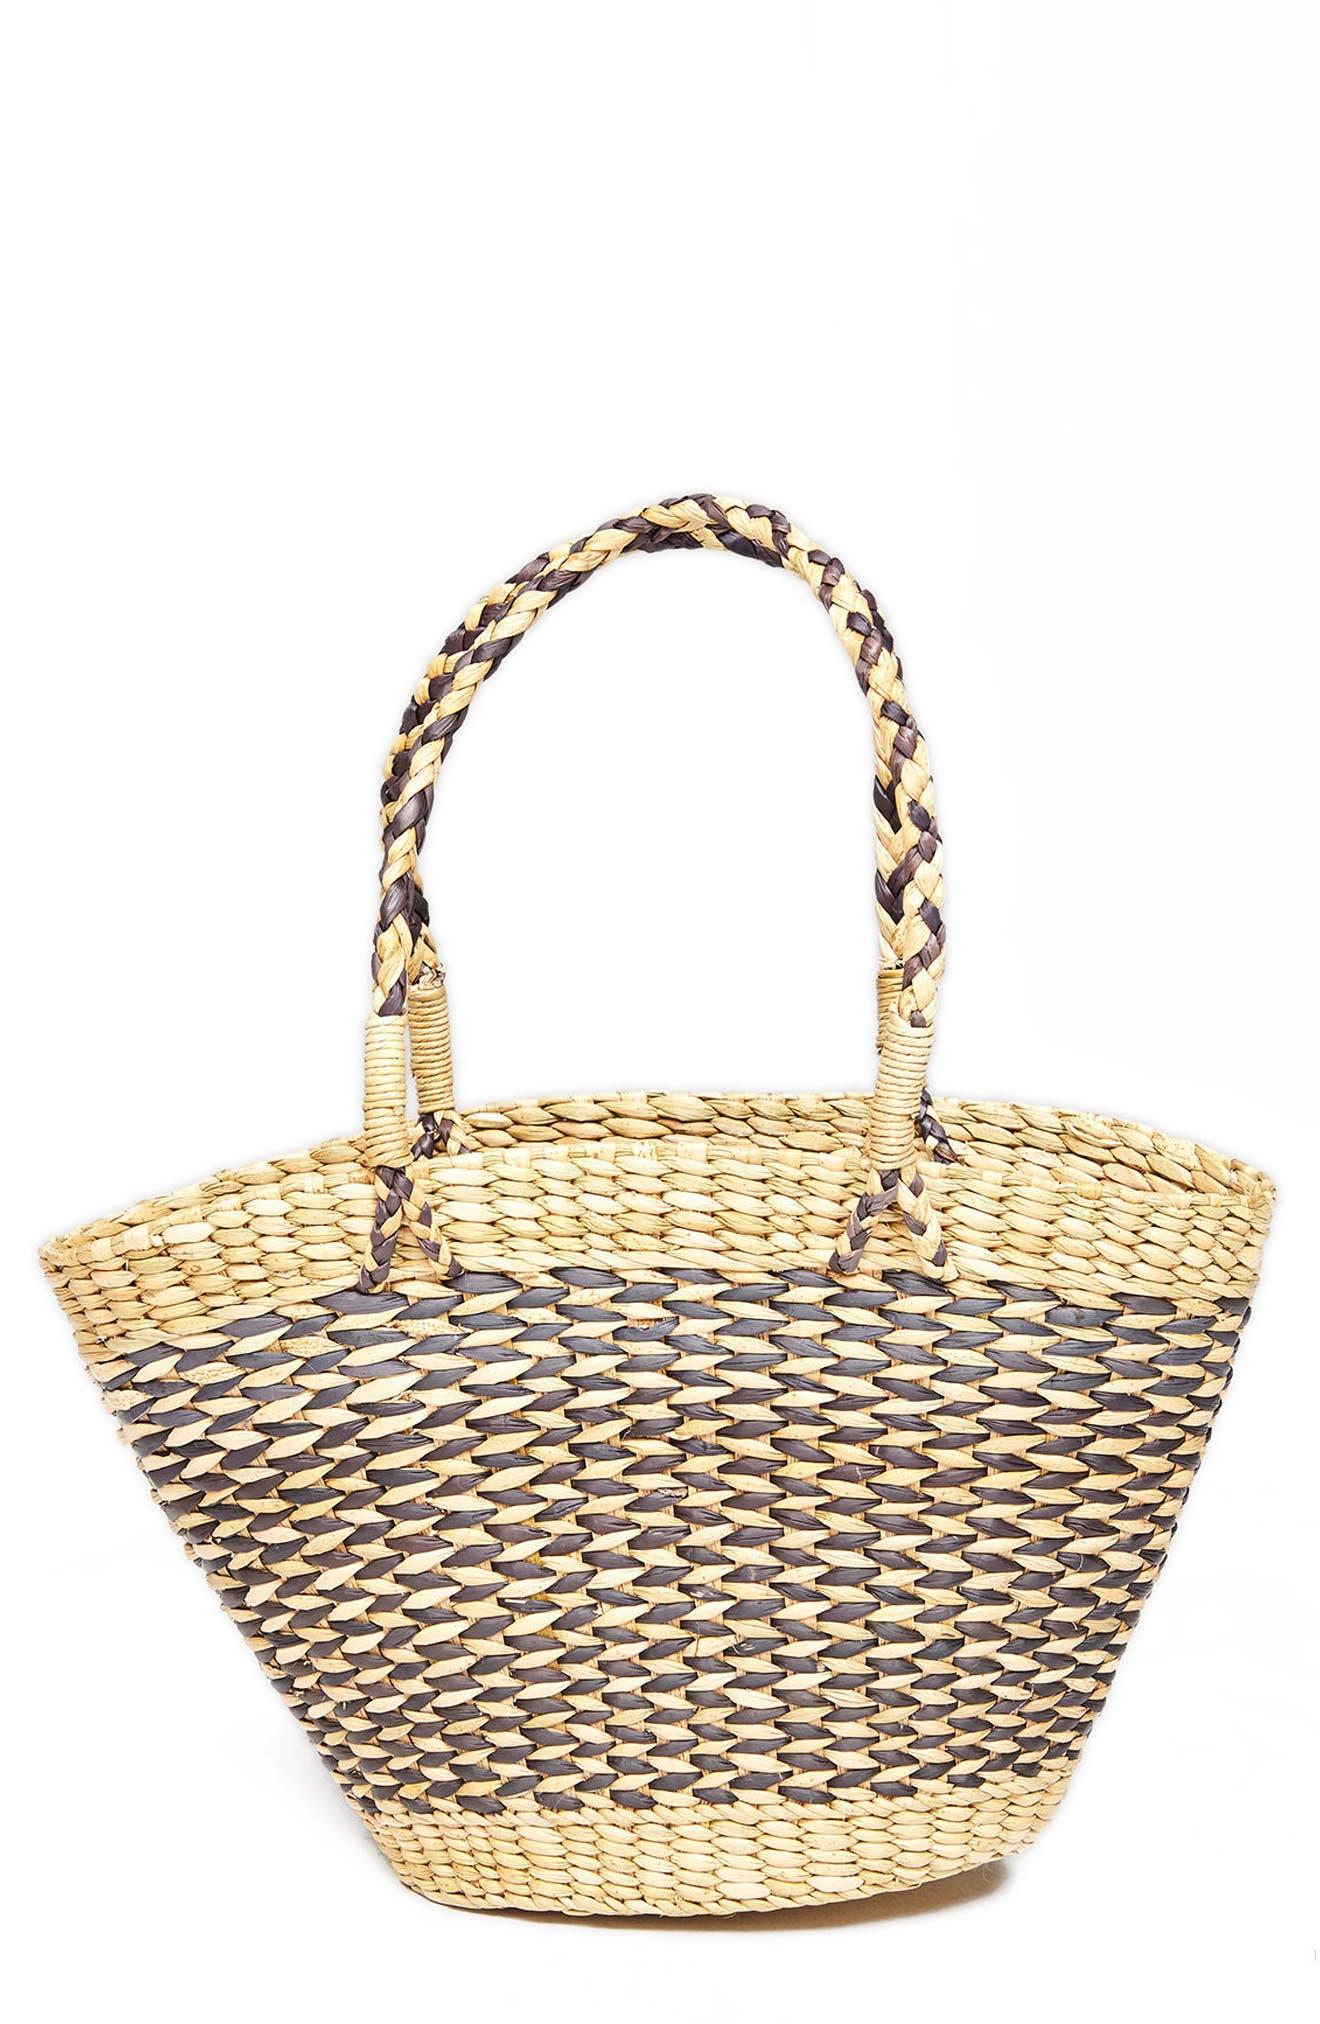 Amuse Society Goodie Basket Straw Tote